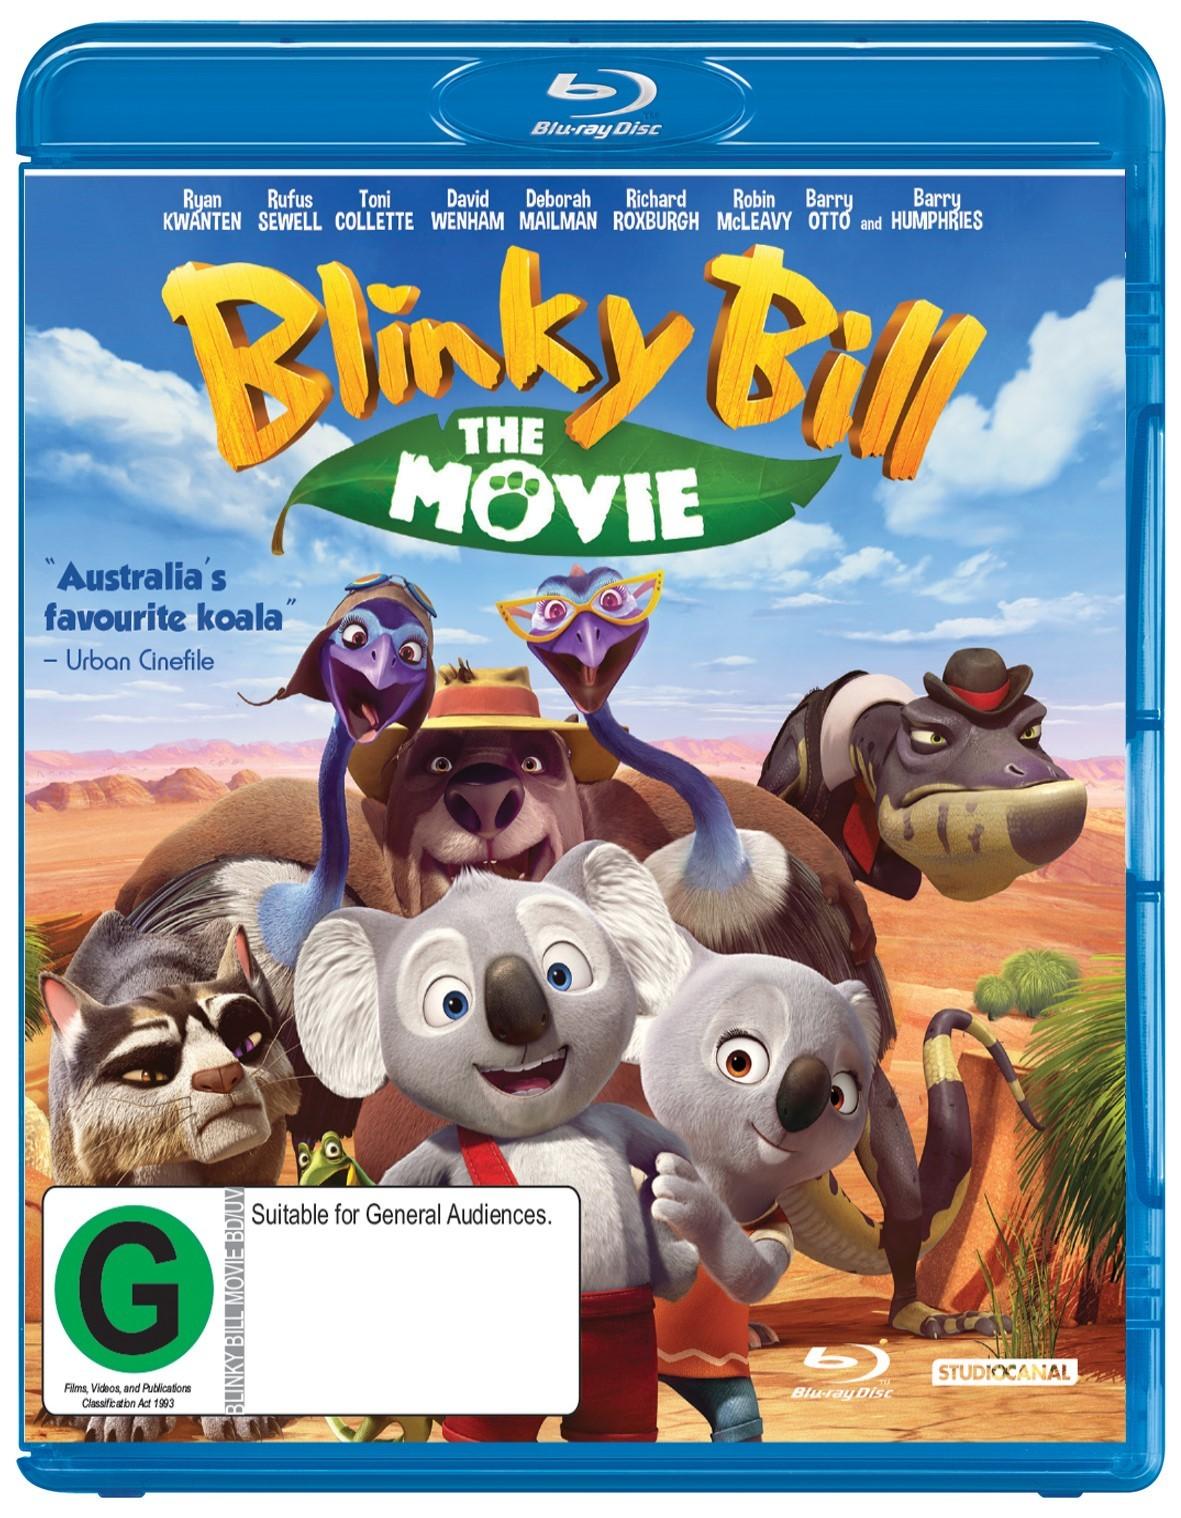 Blinky Bill - The Movie on Blu-ray image